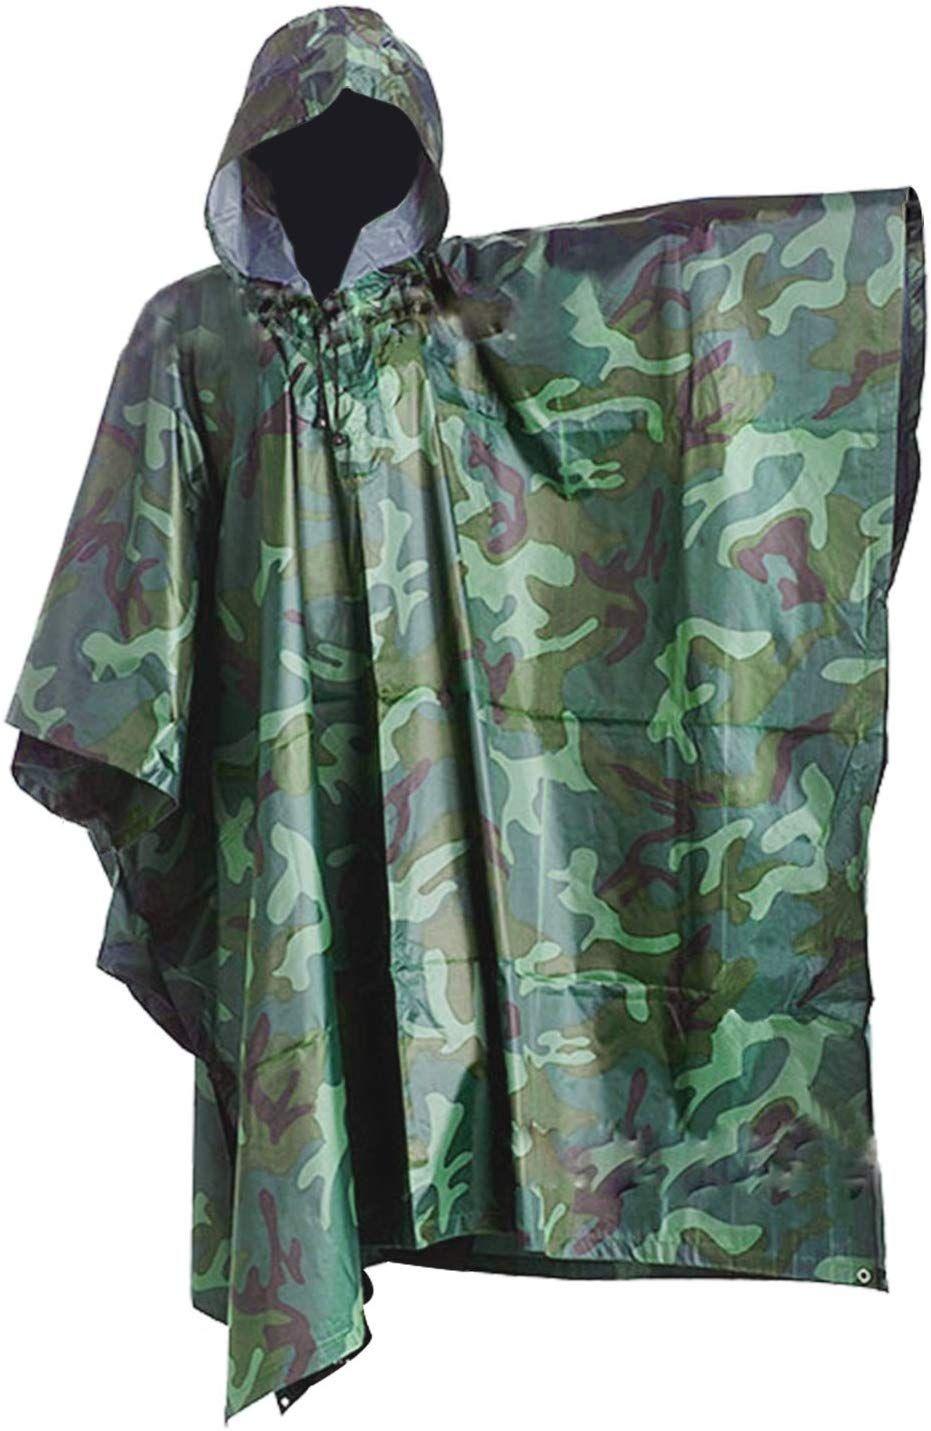 Lluvia Color DigHealth Impermeable de Militar by Poncho Camuflaje dUAqw06dx